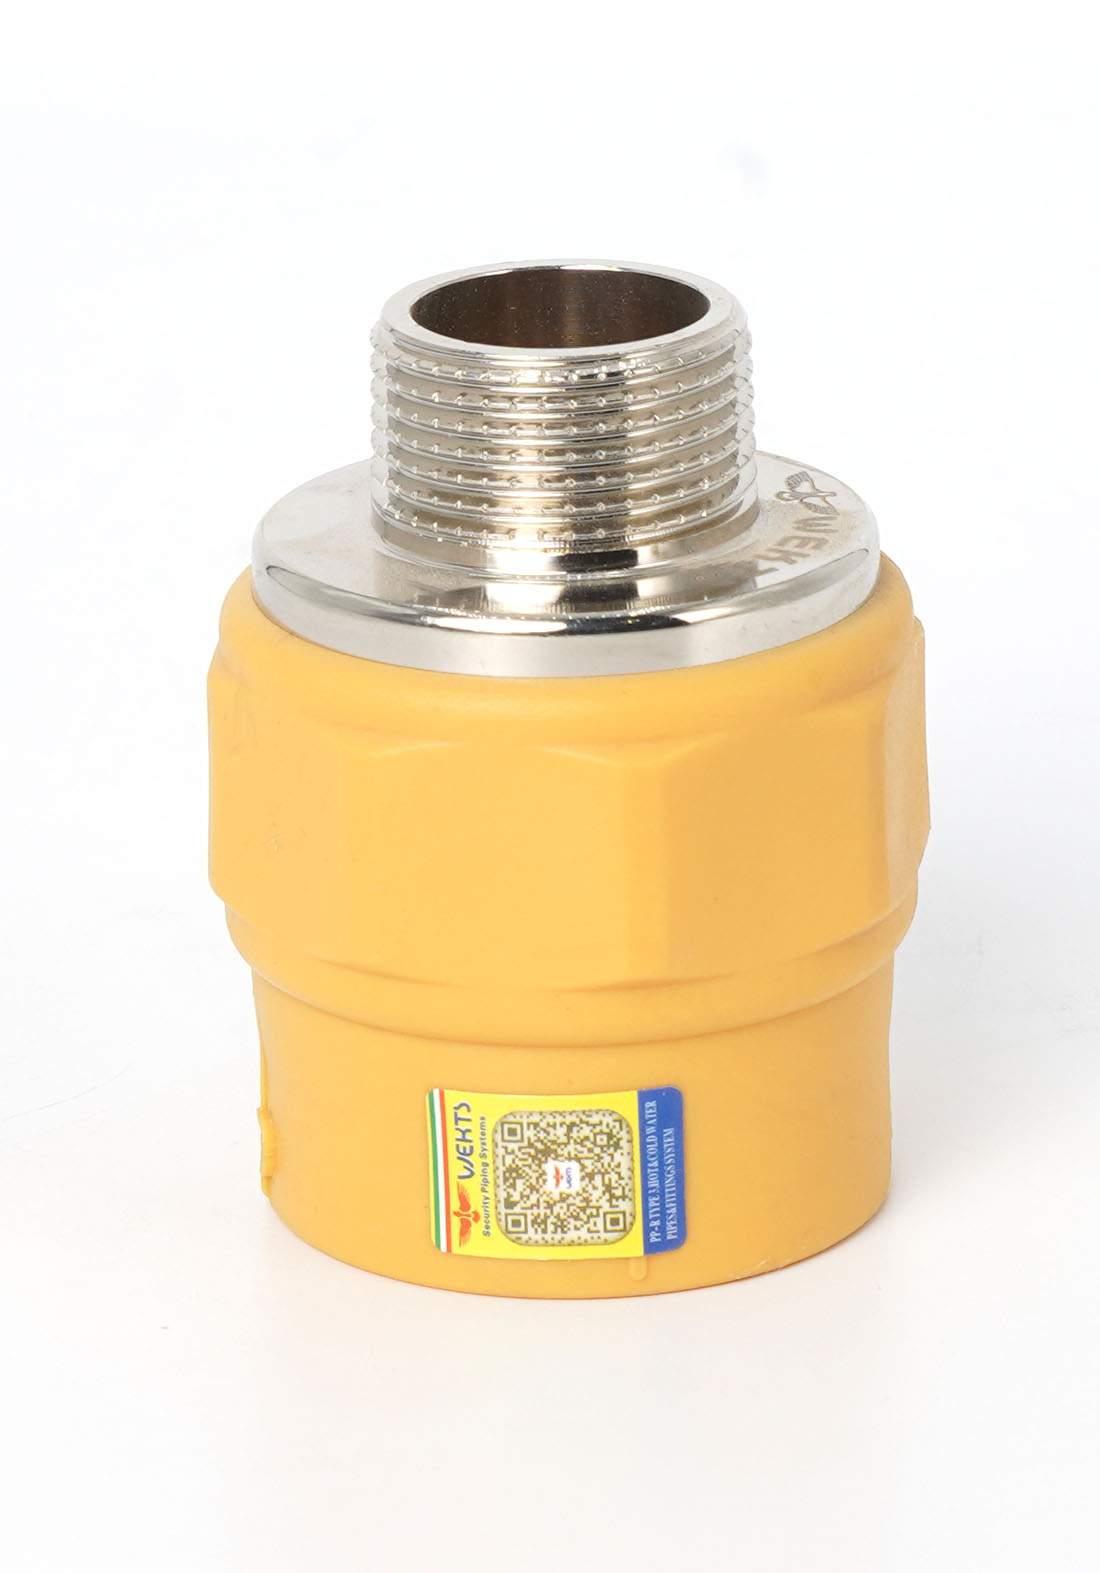 "Wekts 5605 Connector Pipe /Adapter 32 × 3/4"" سن  انابيب   ماء خارجي"